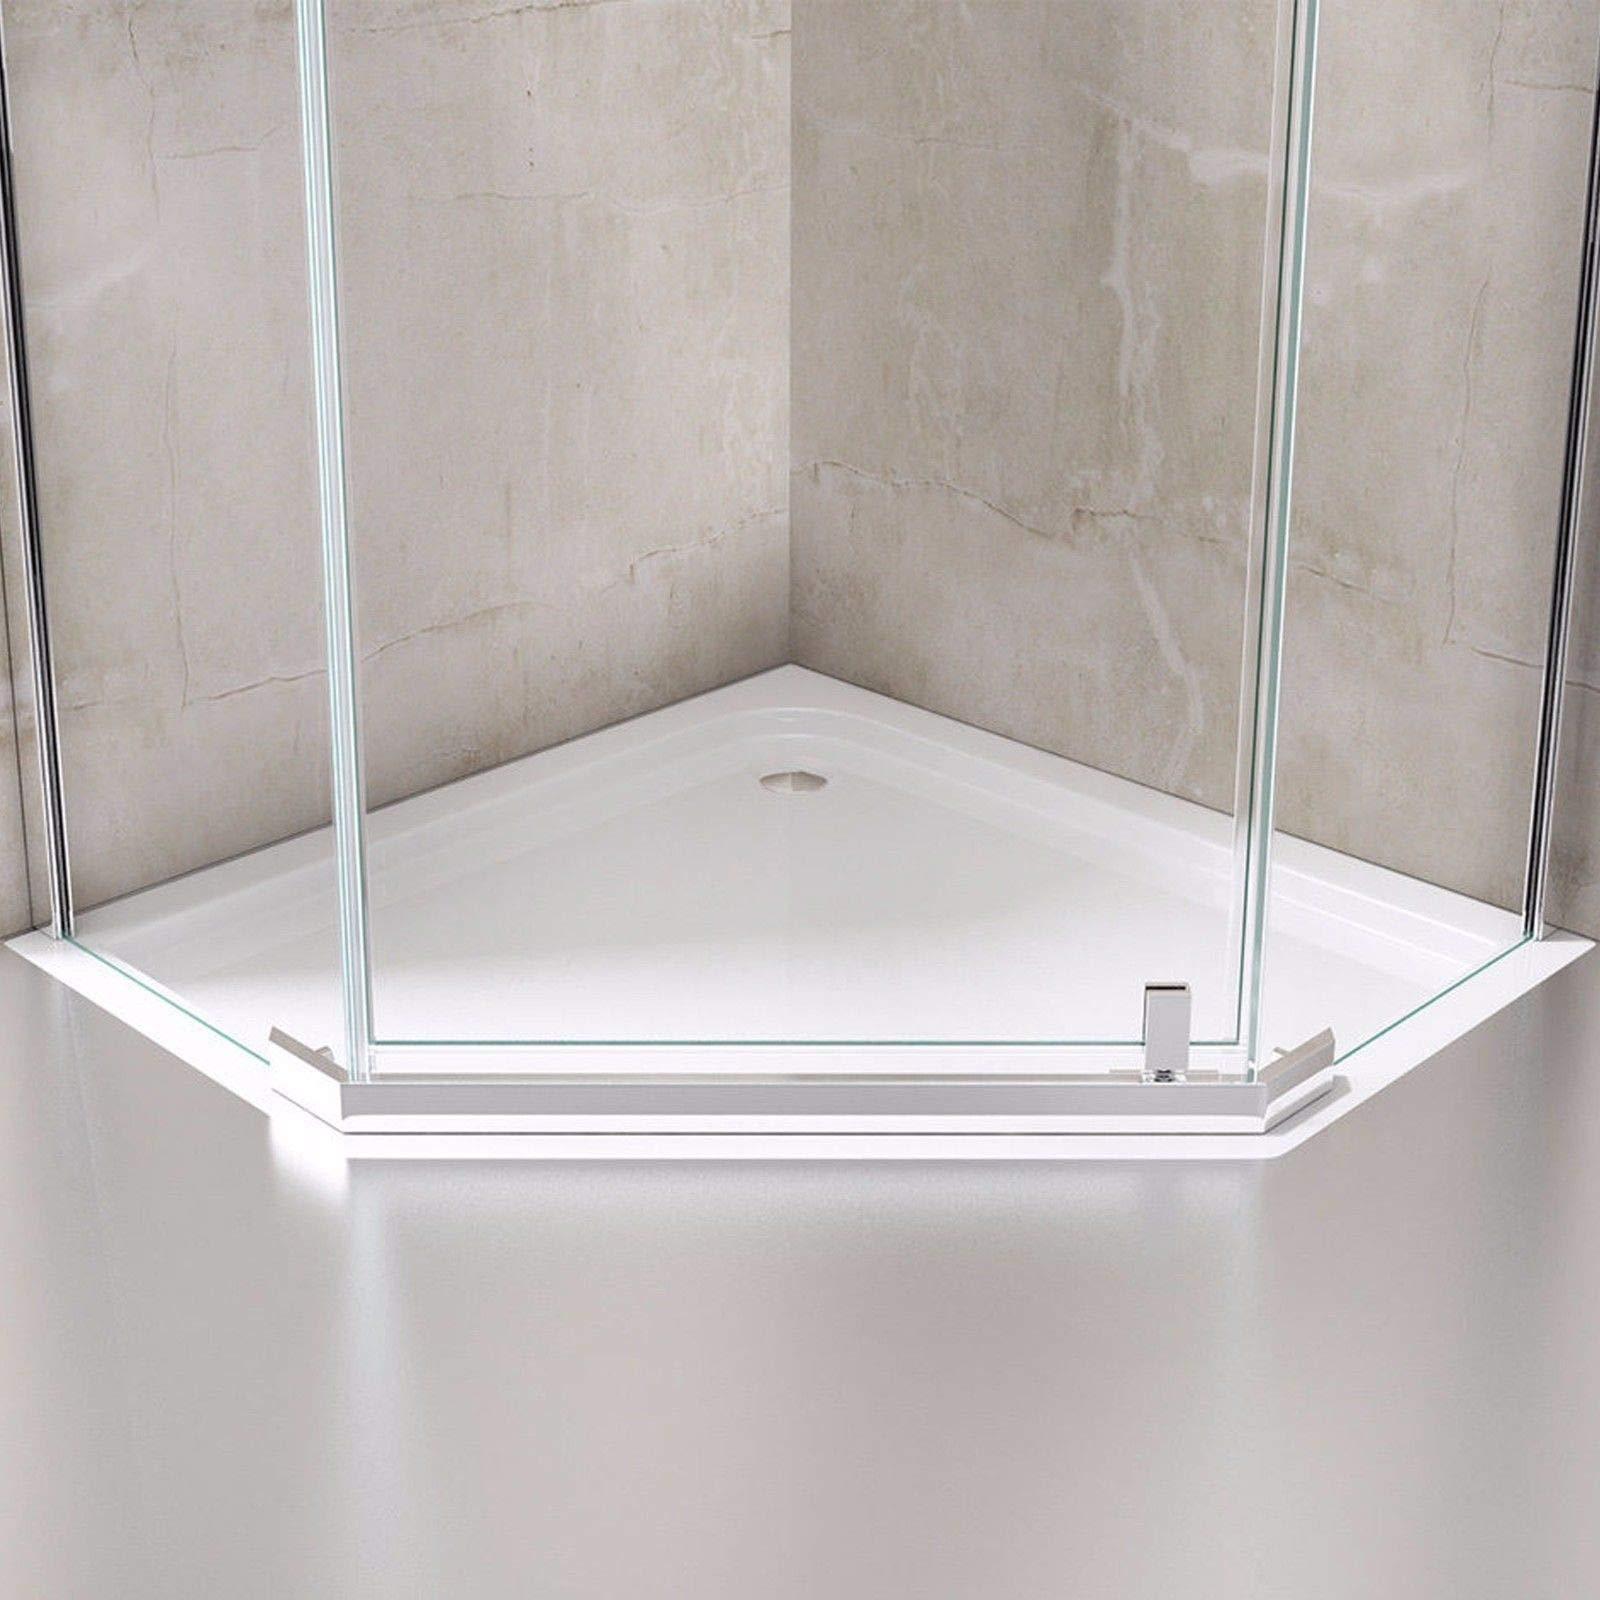 durovin baños Ravenna 8 Pentagonal sin marco 8 mm Pivot cristal ...